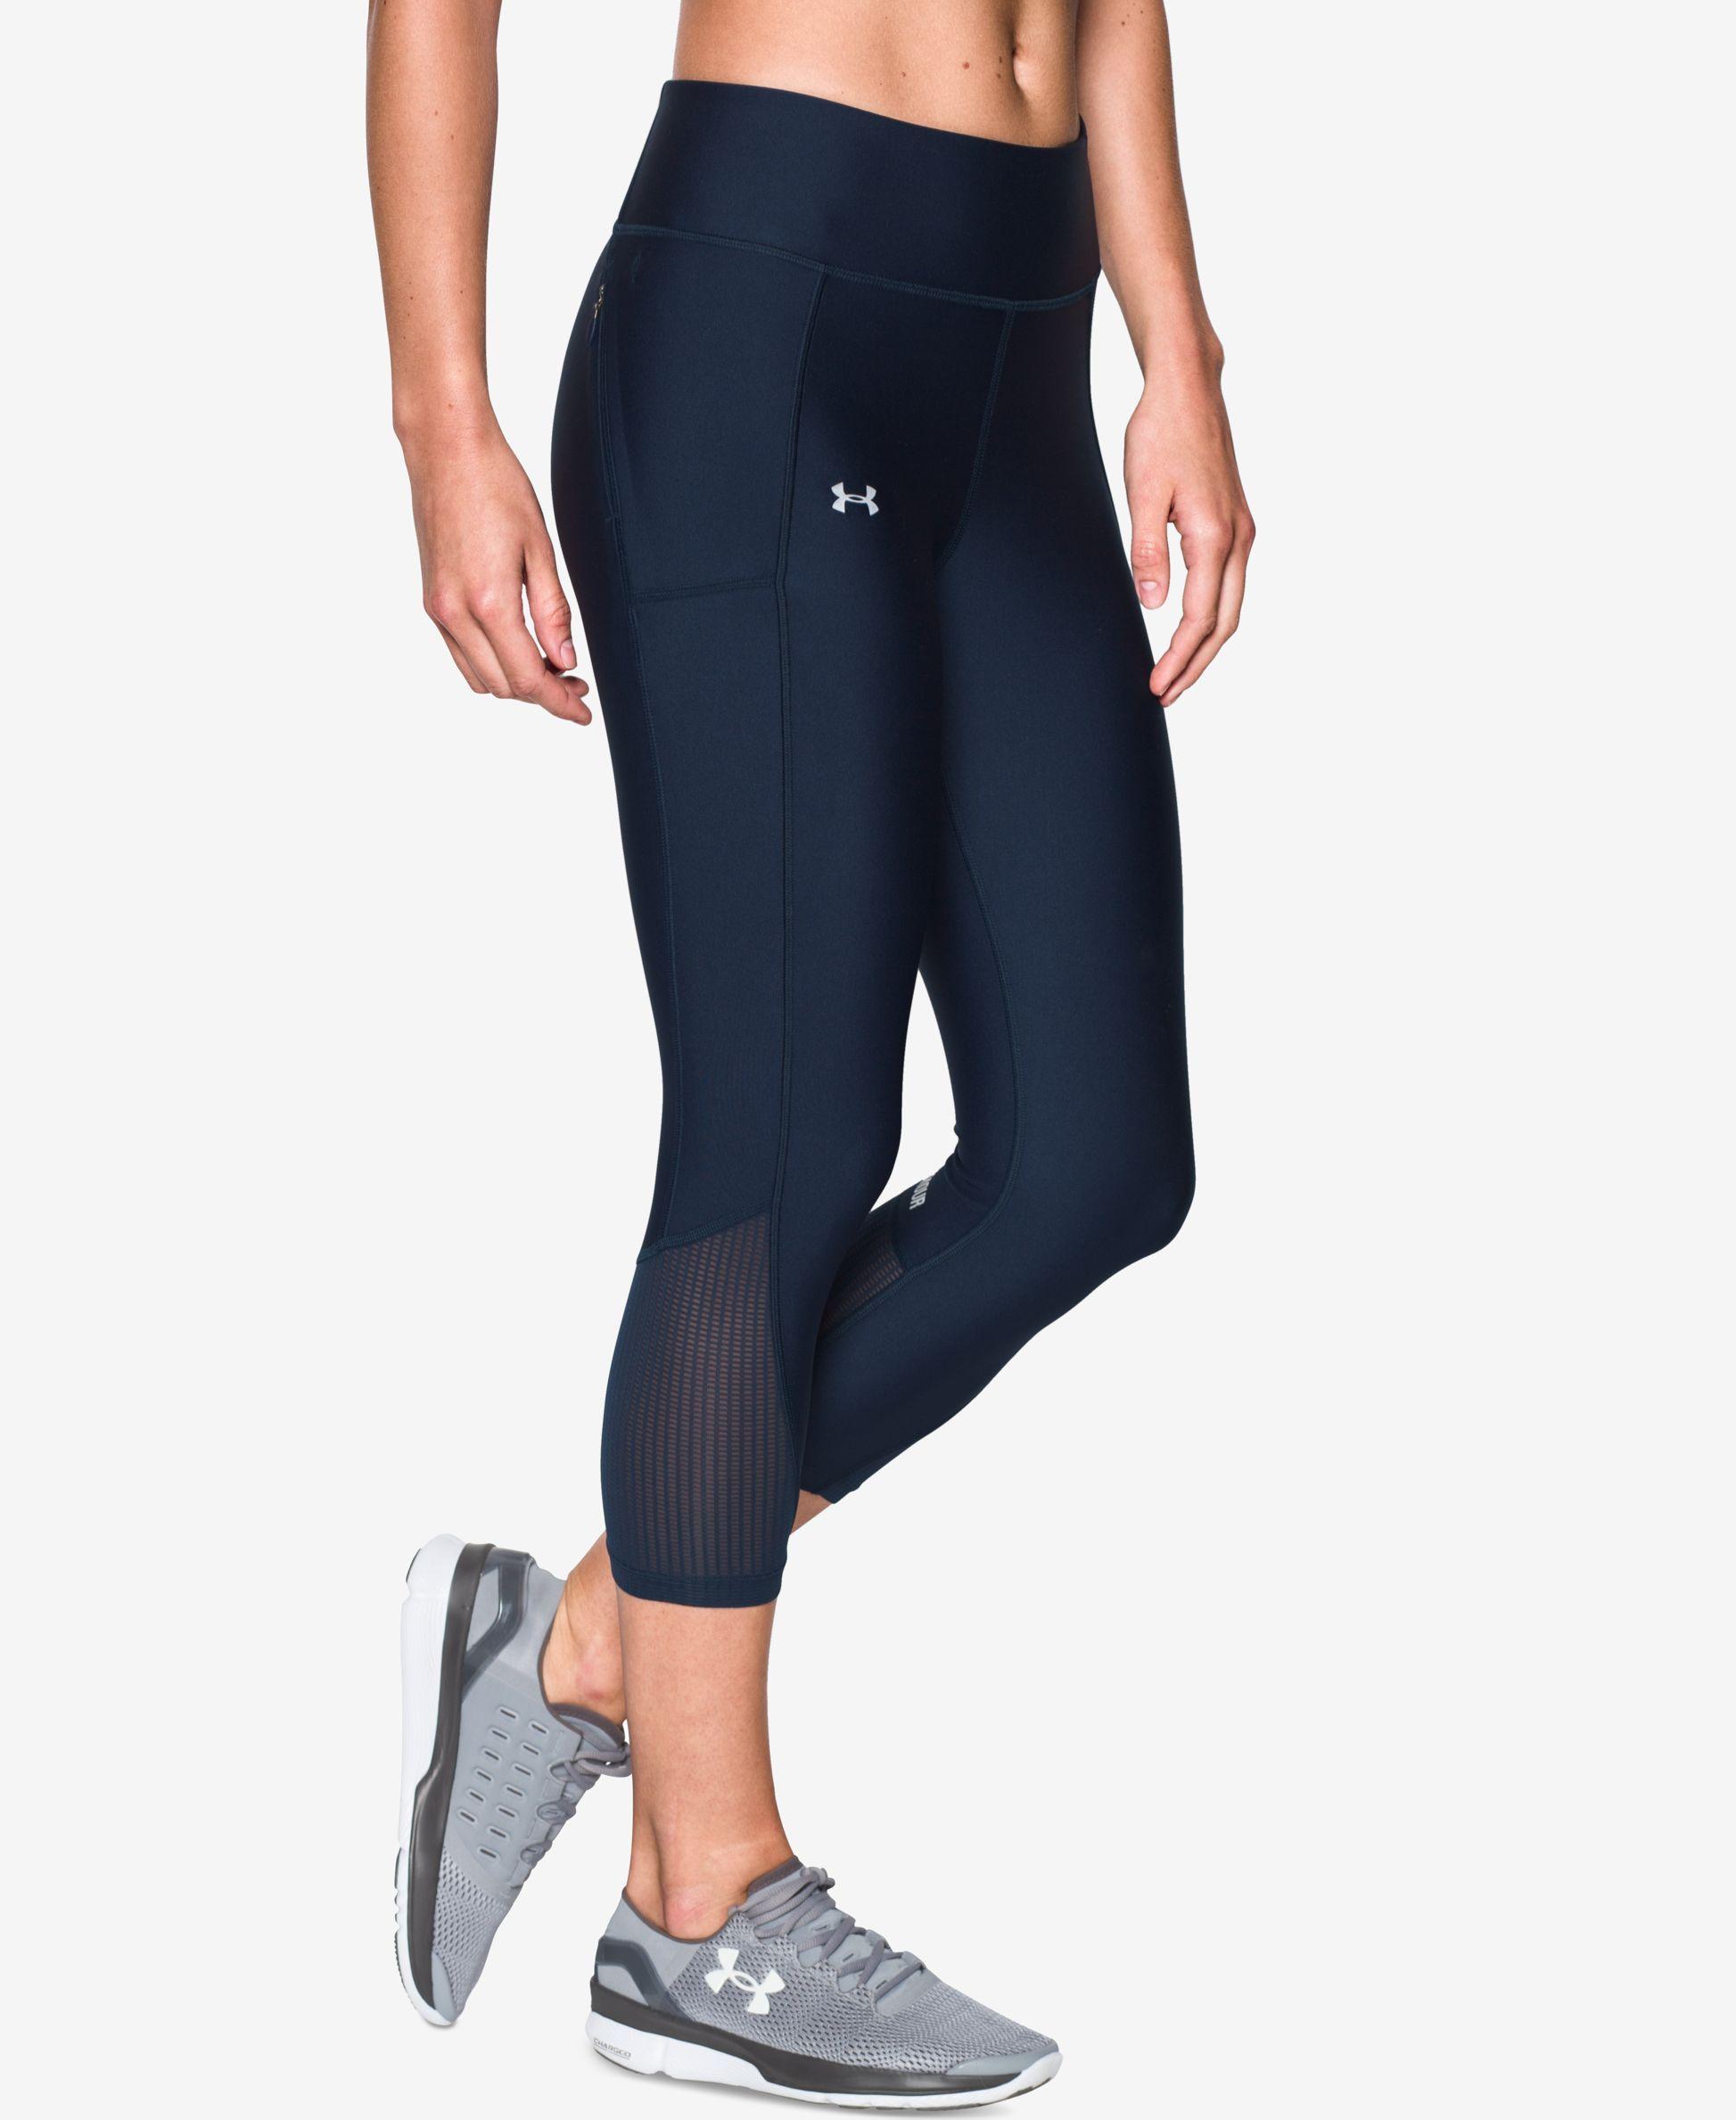 Under Armour HeatGear Womens Capri Tights Black Gym Running Sports Training UA